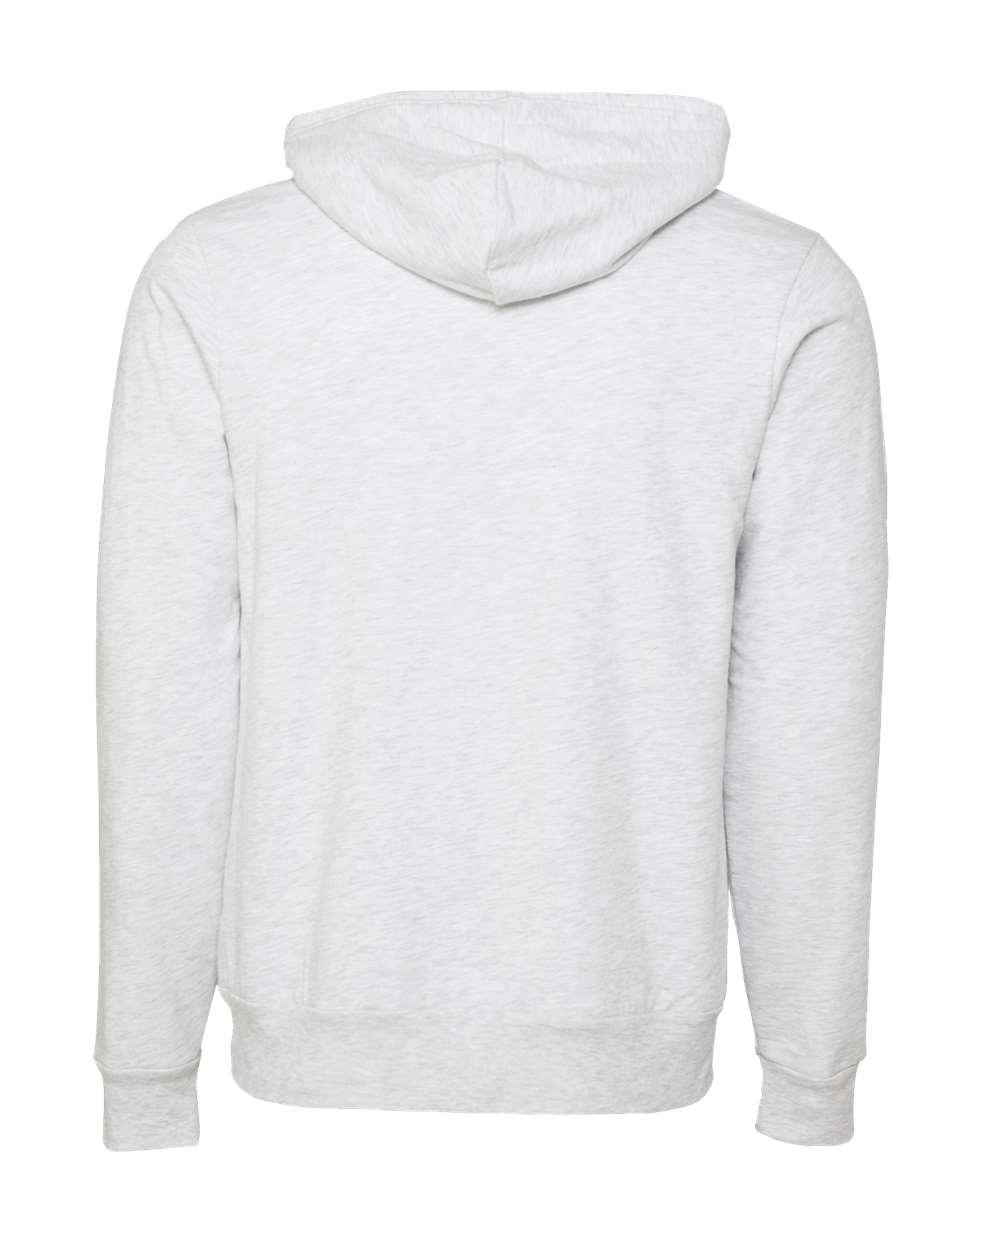 Bella-Canvas-Unisex-Sponge-Hooded-Pullover-Sweatshirt-Blank-3719-up-to-2XL thumbnail 6